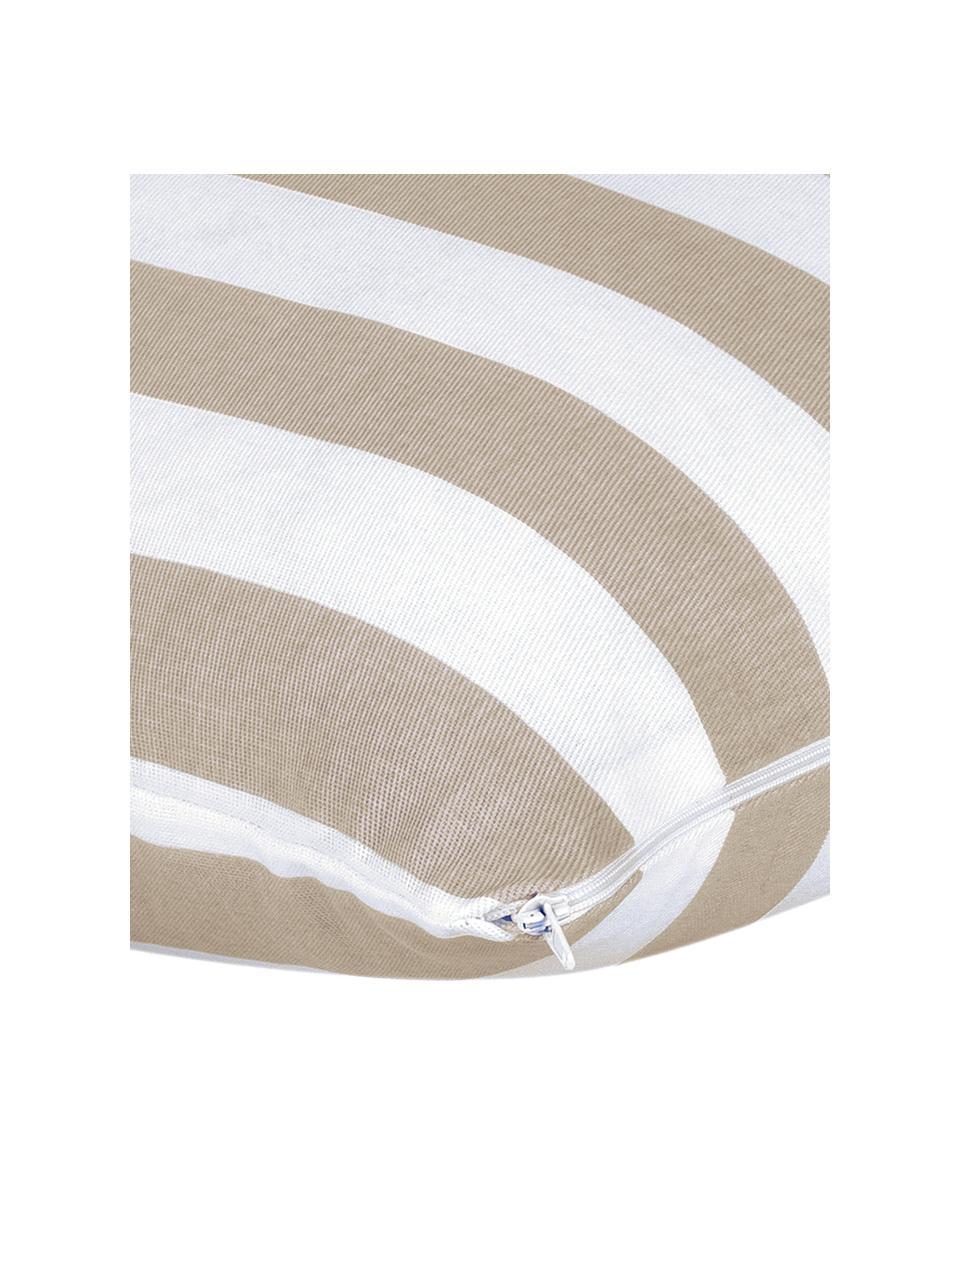 Federa arredo a righe color beige/bianco Timon, 100% cotone, Taupe, bianco, Larg. 50 x Lung. 50 cm